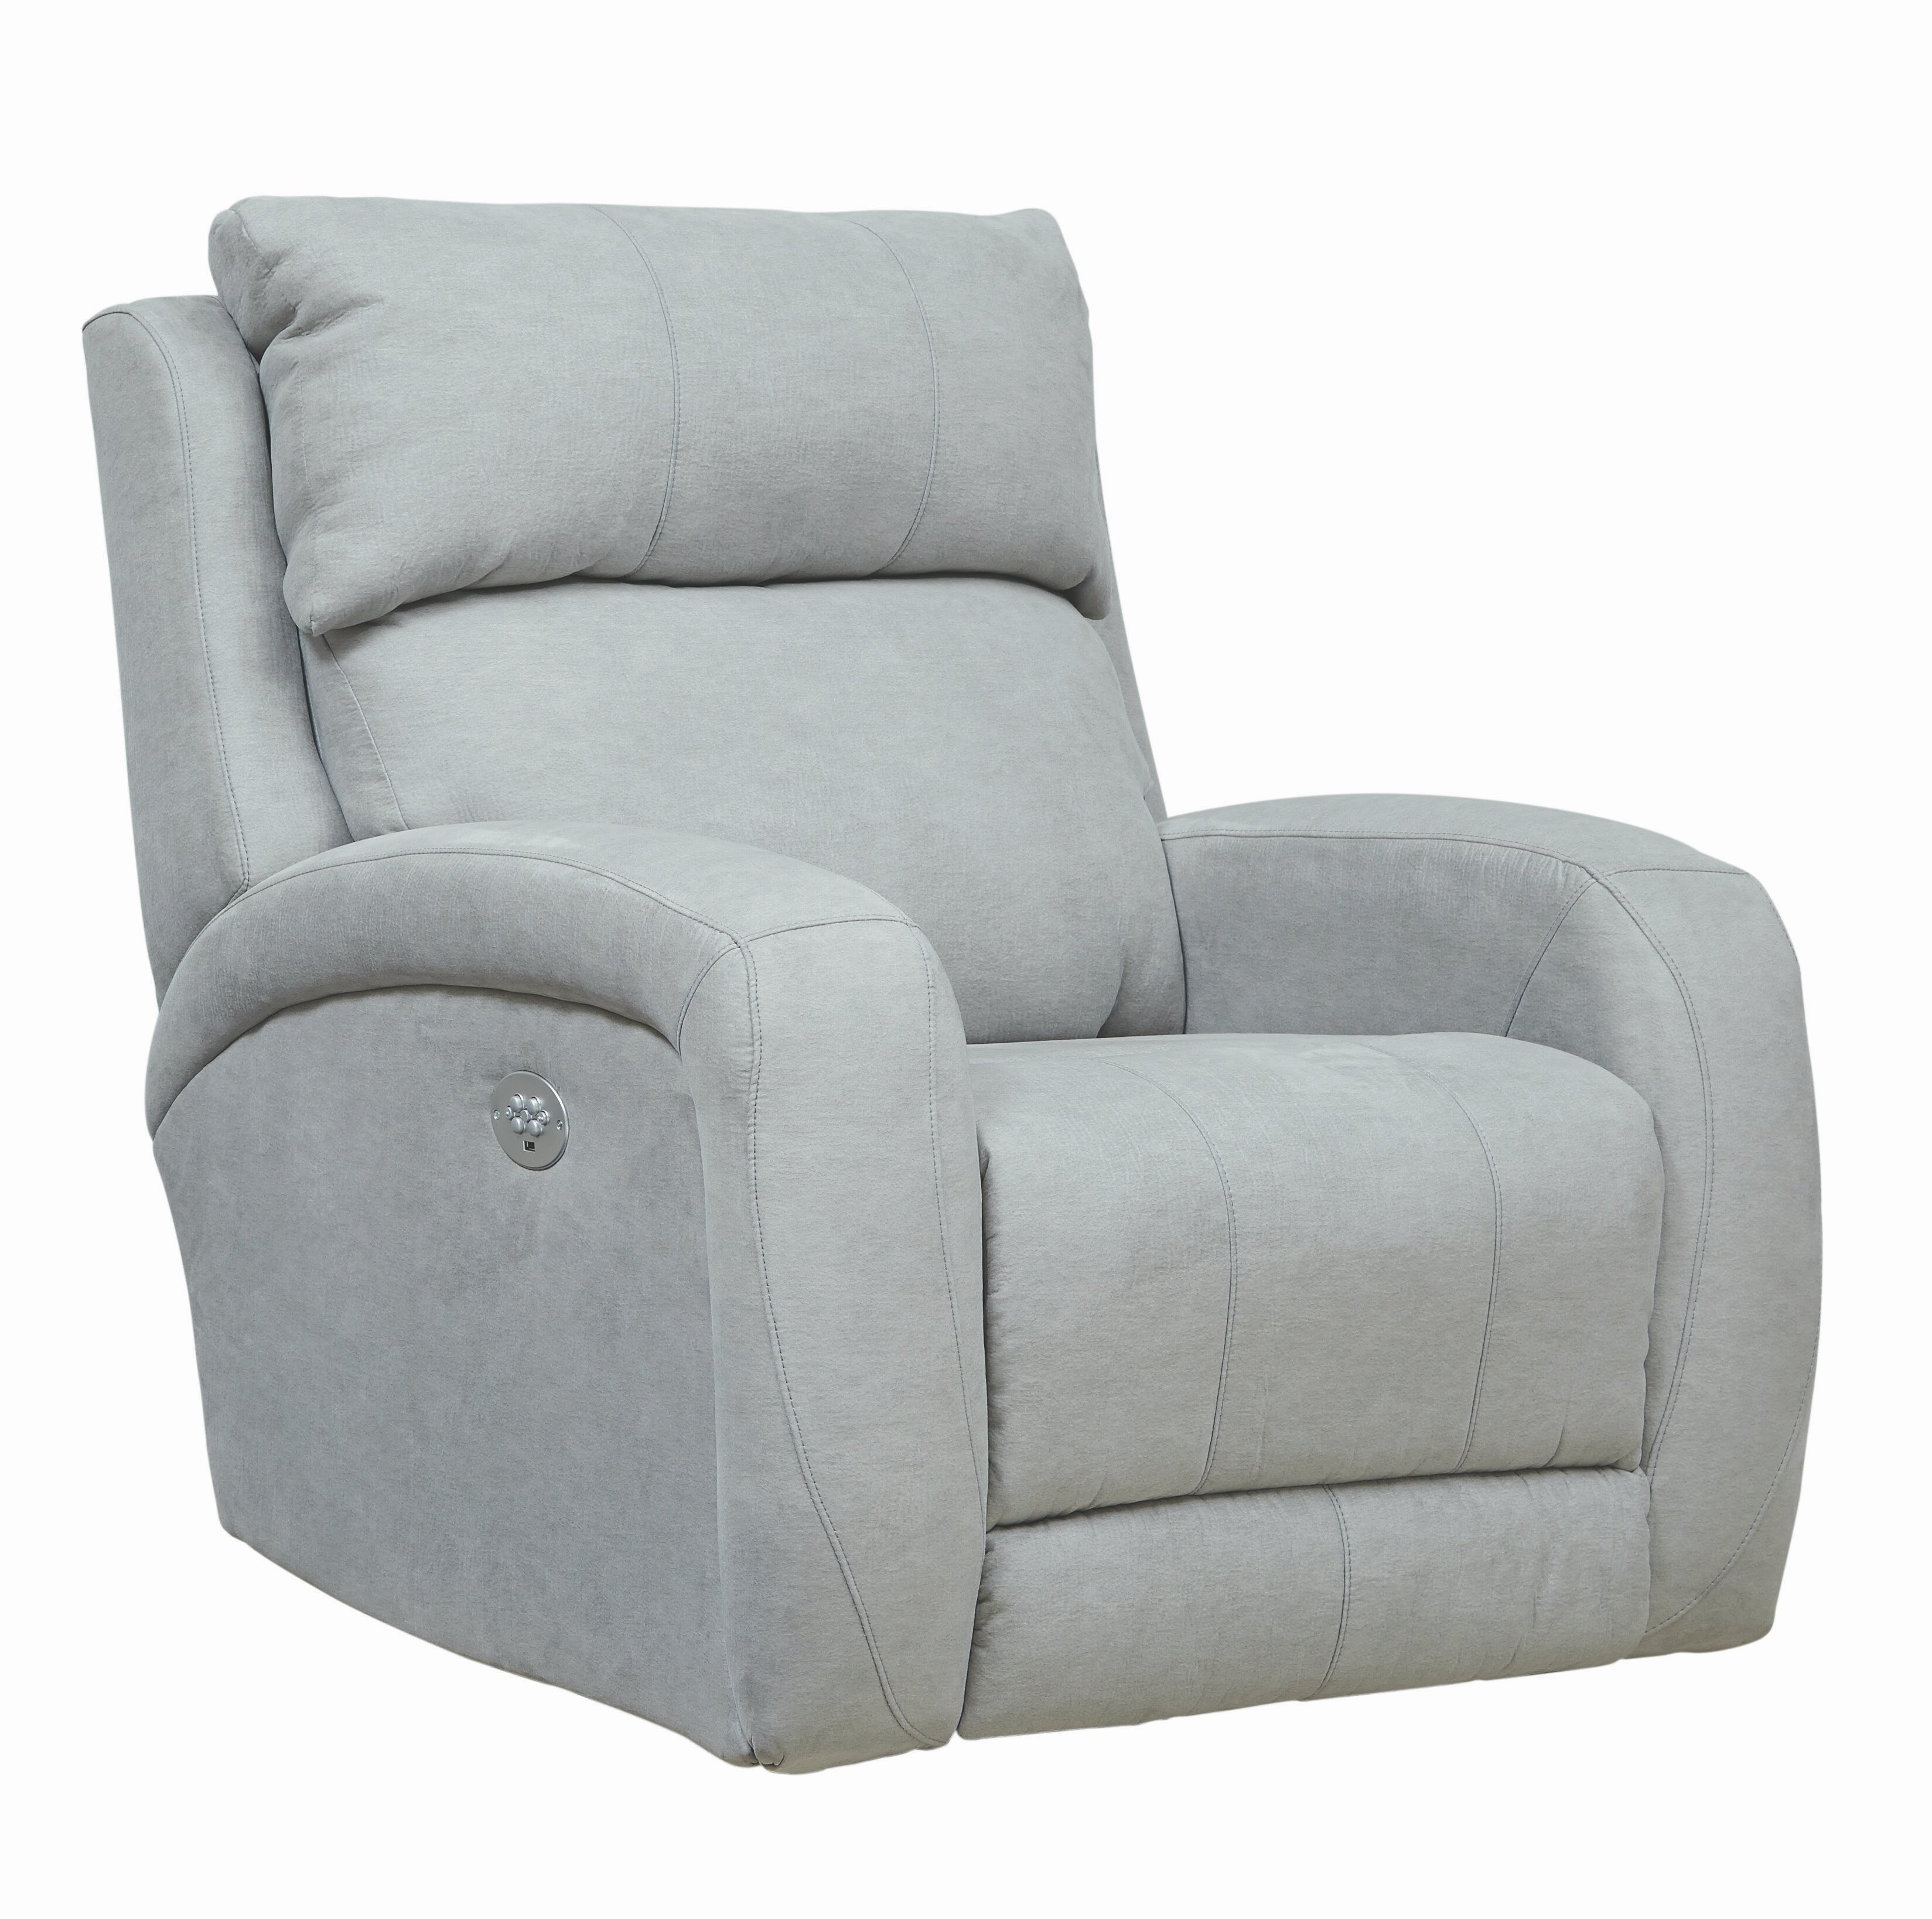 Wondrous Dawson Headrest Power Rocker Recliner Dailytribune Chair Design For Home Dailytribuneorg